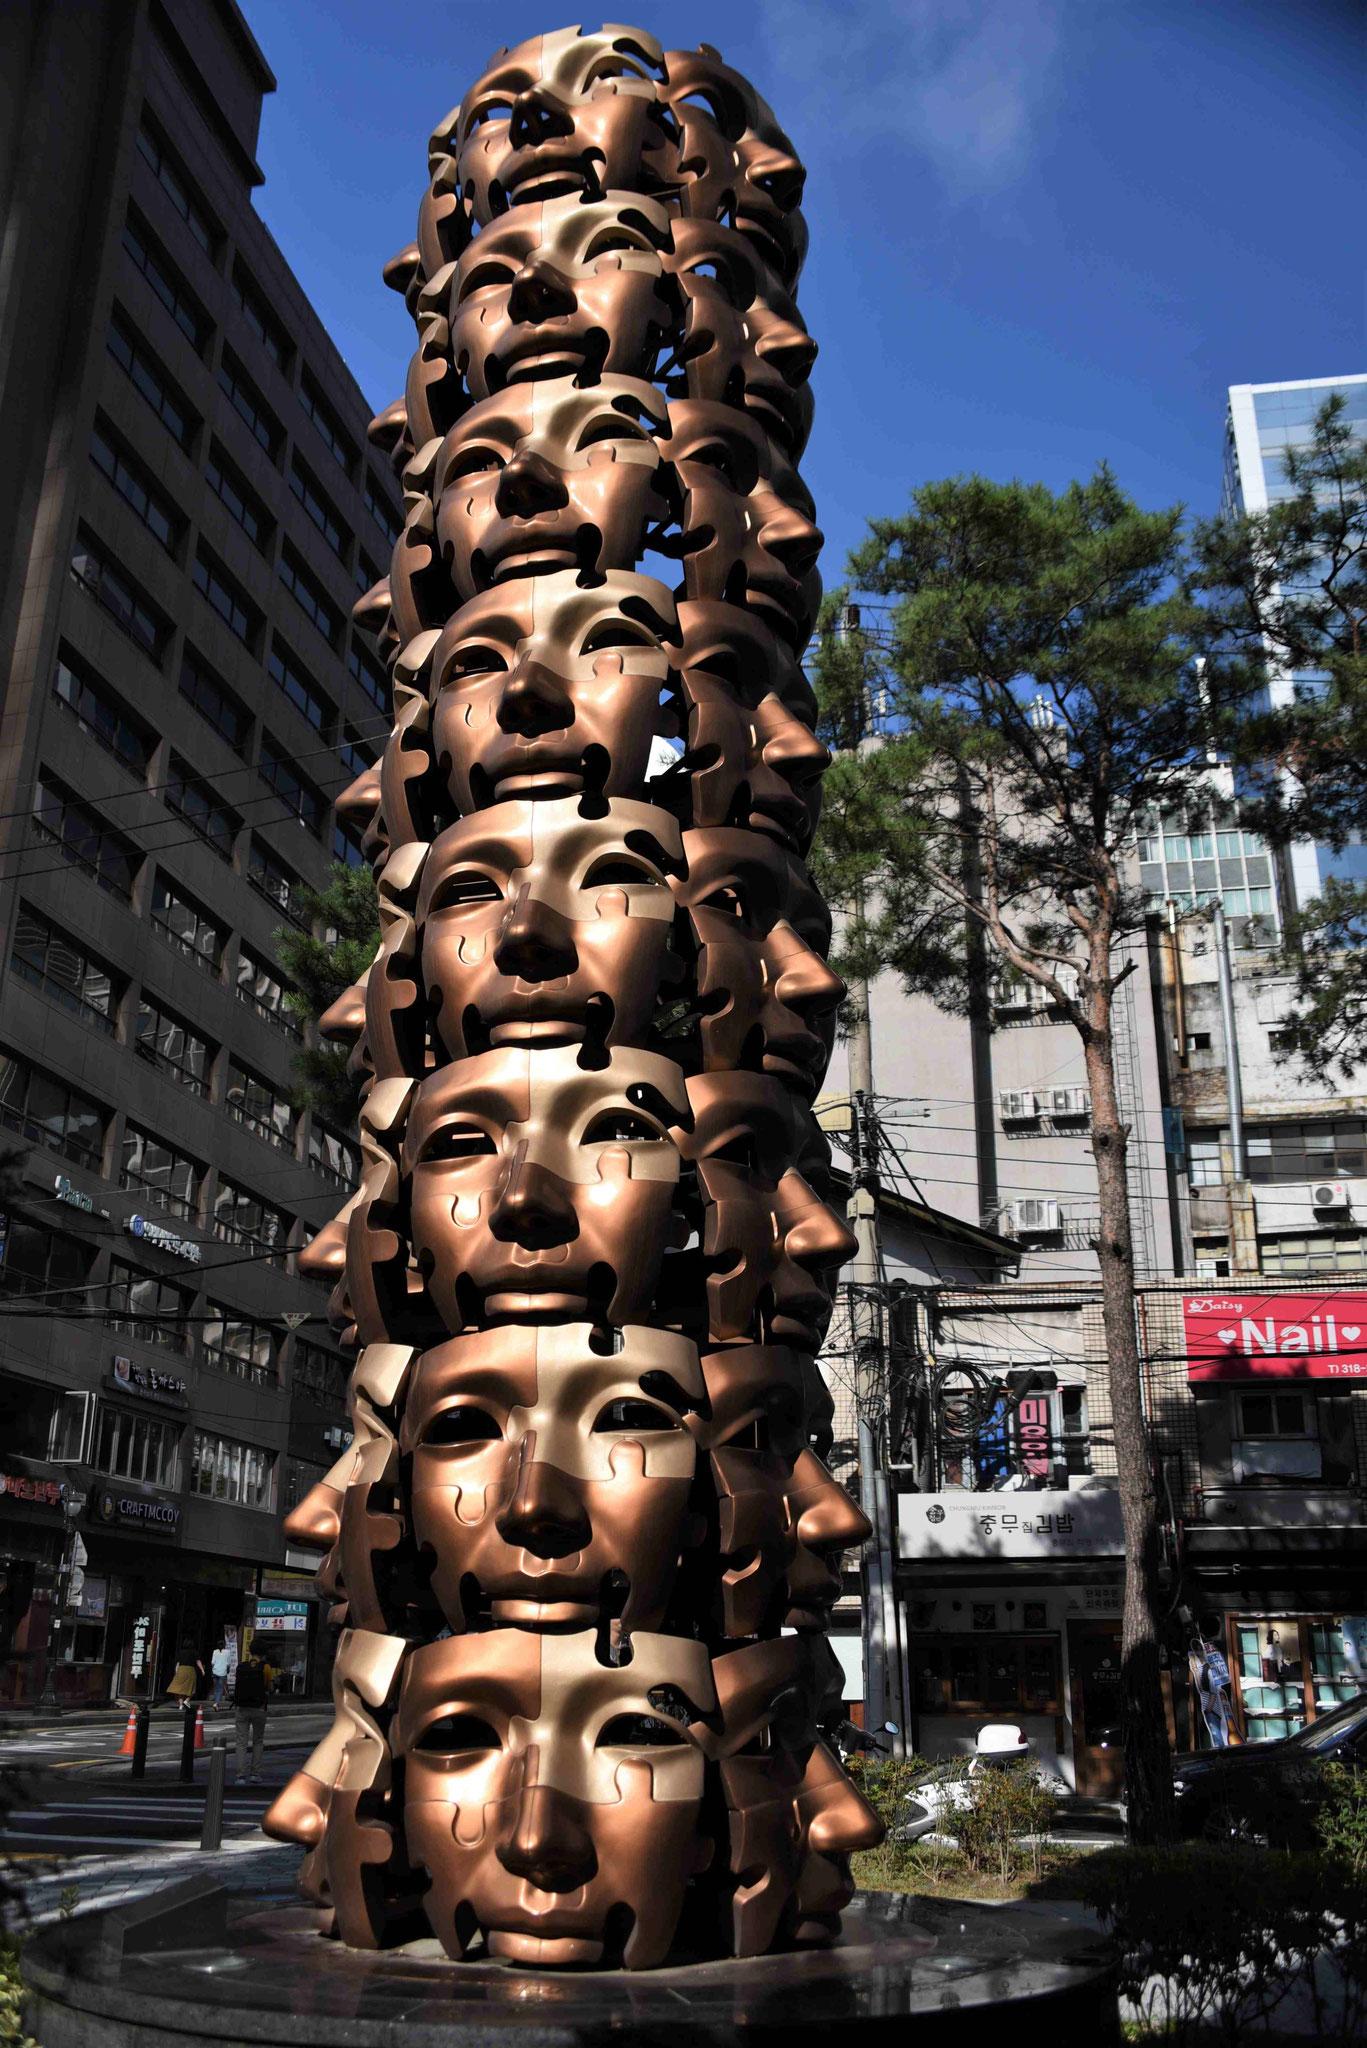 Maskenkunst - der Koreaner mag keinen direkten Blickkontakt